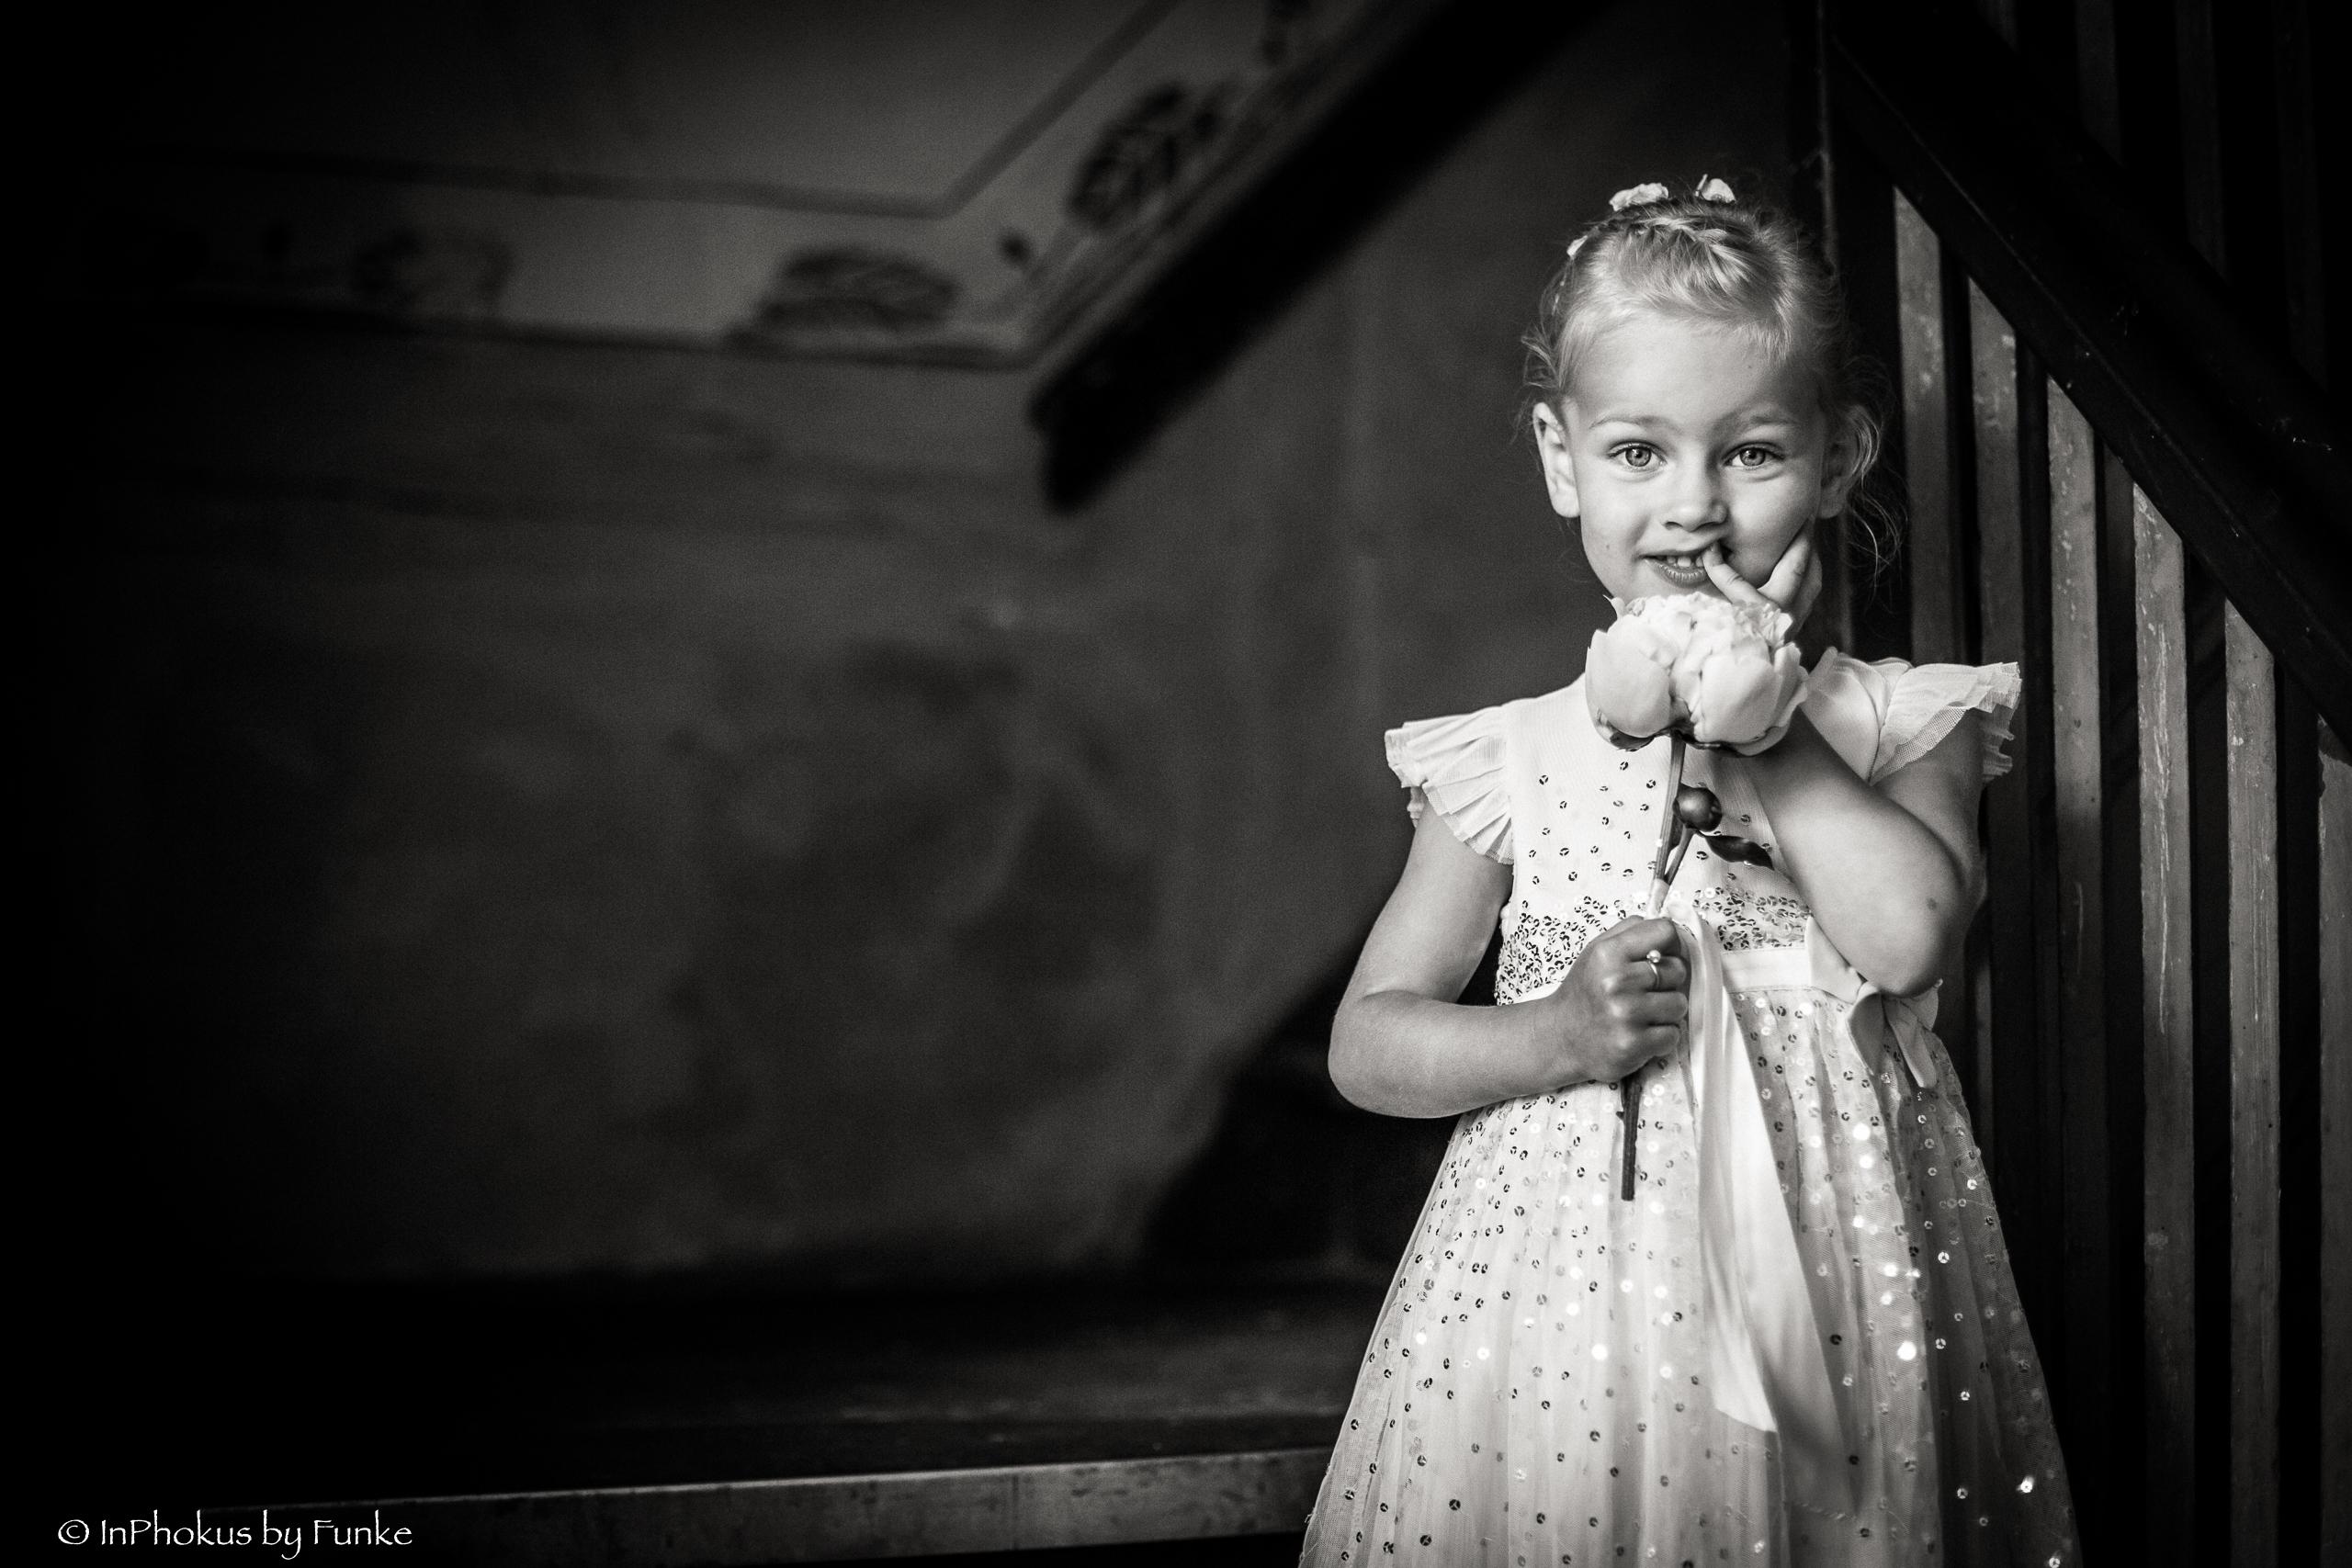 Bröllop_-_Emelie_och_Tommy-4488